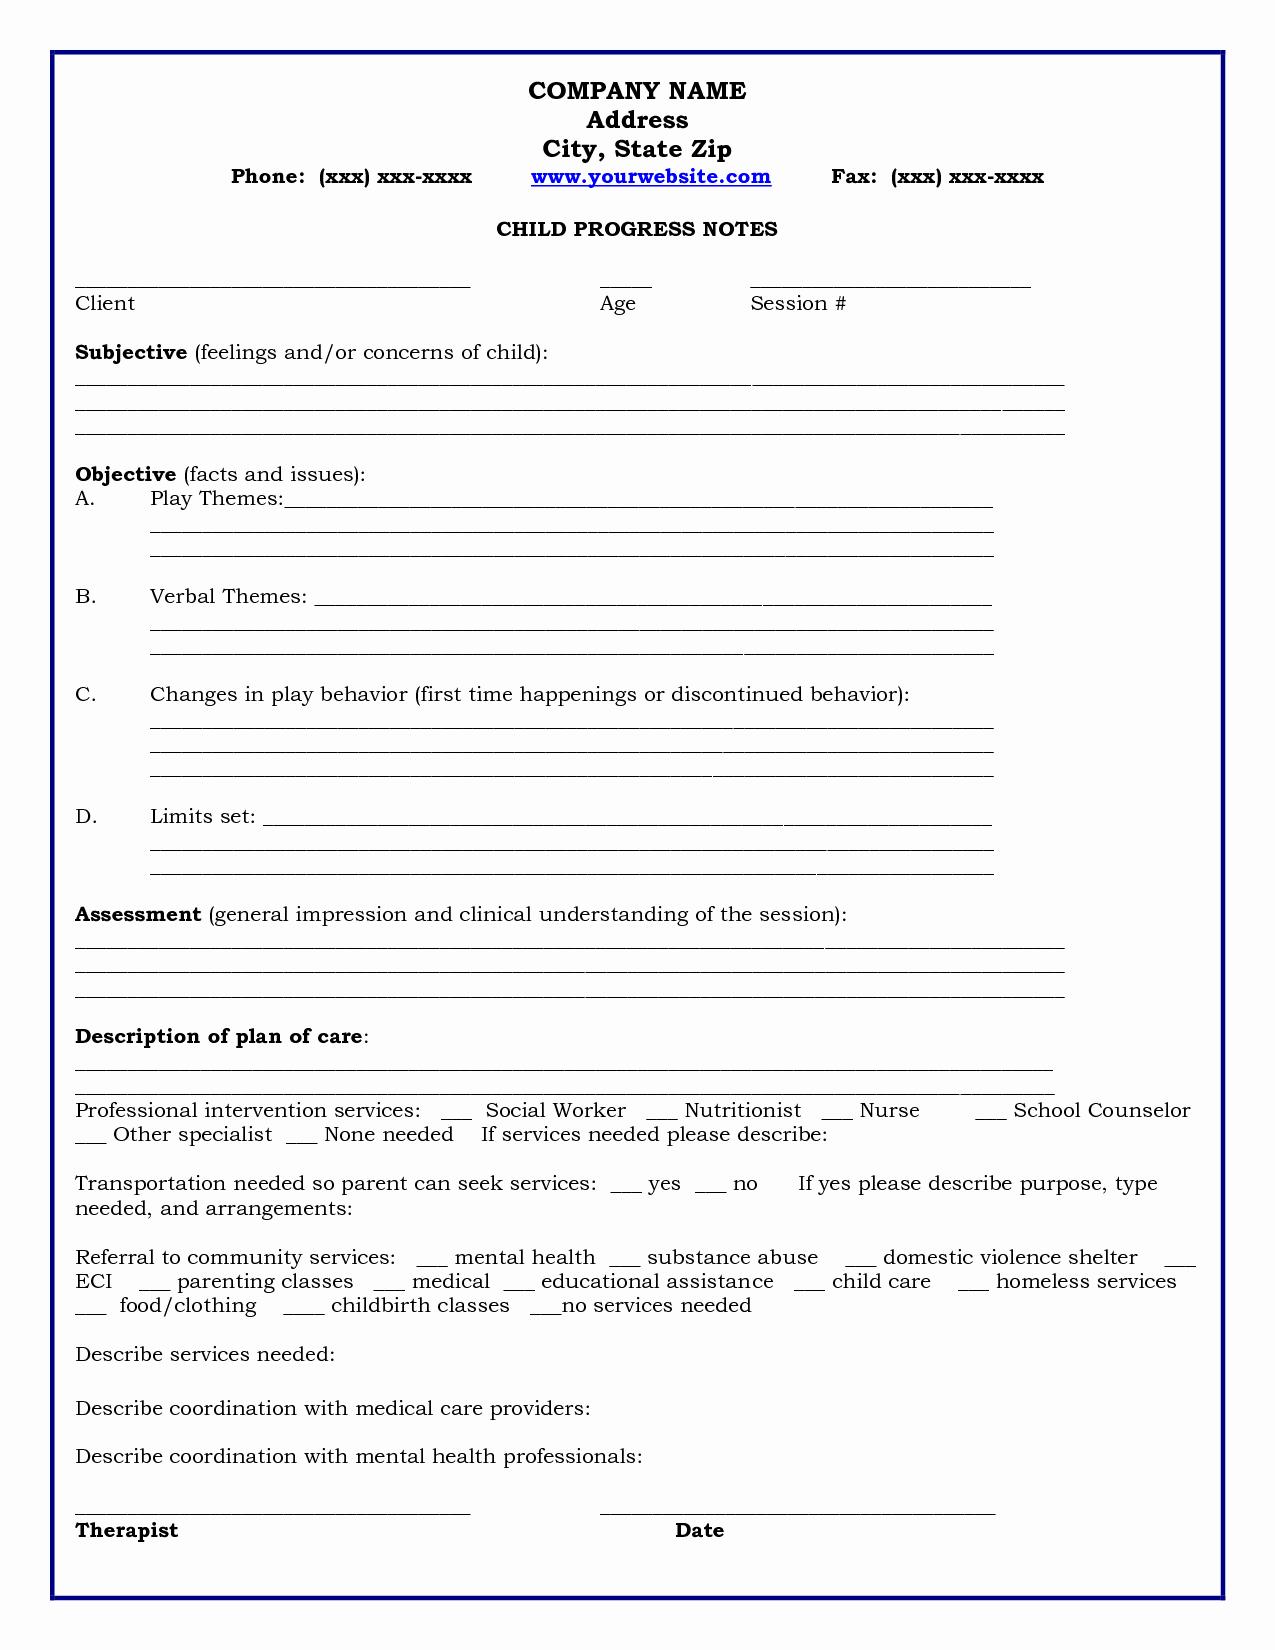 Home Child Progress Notes Medicaid Child Progress